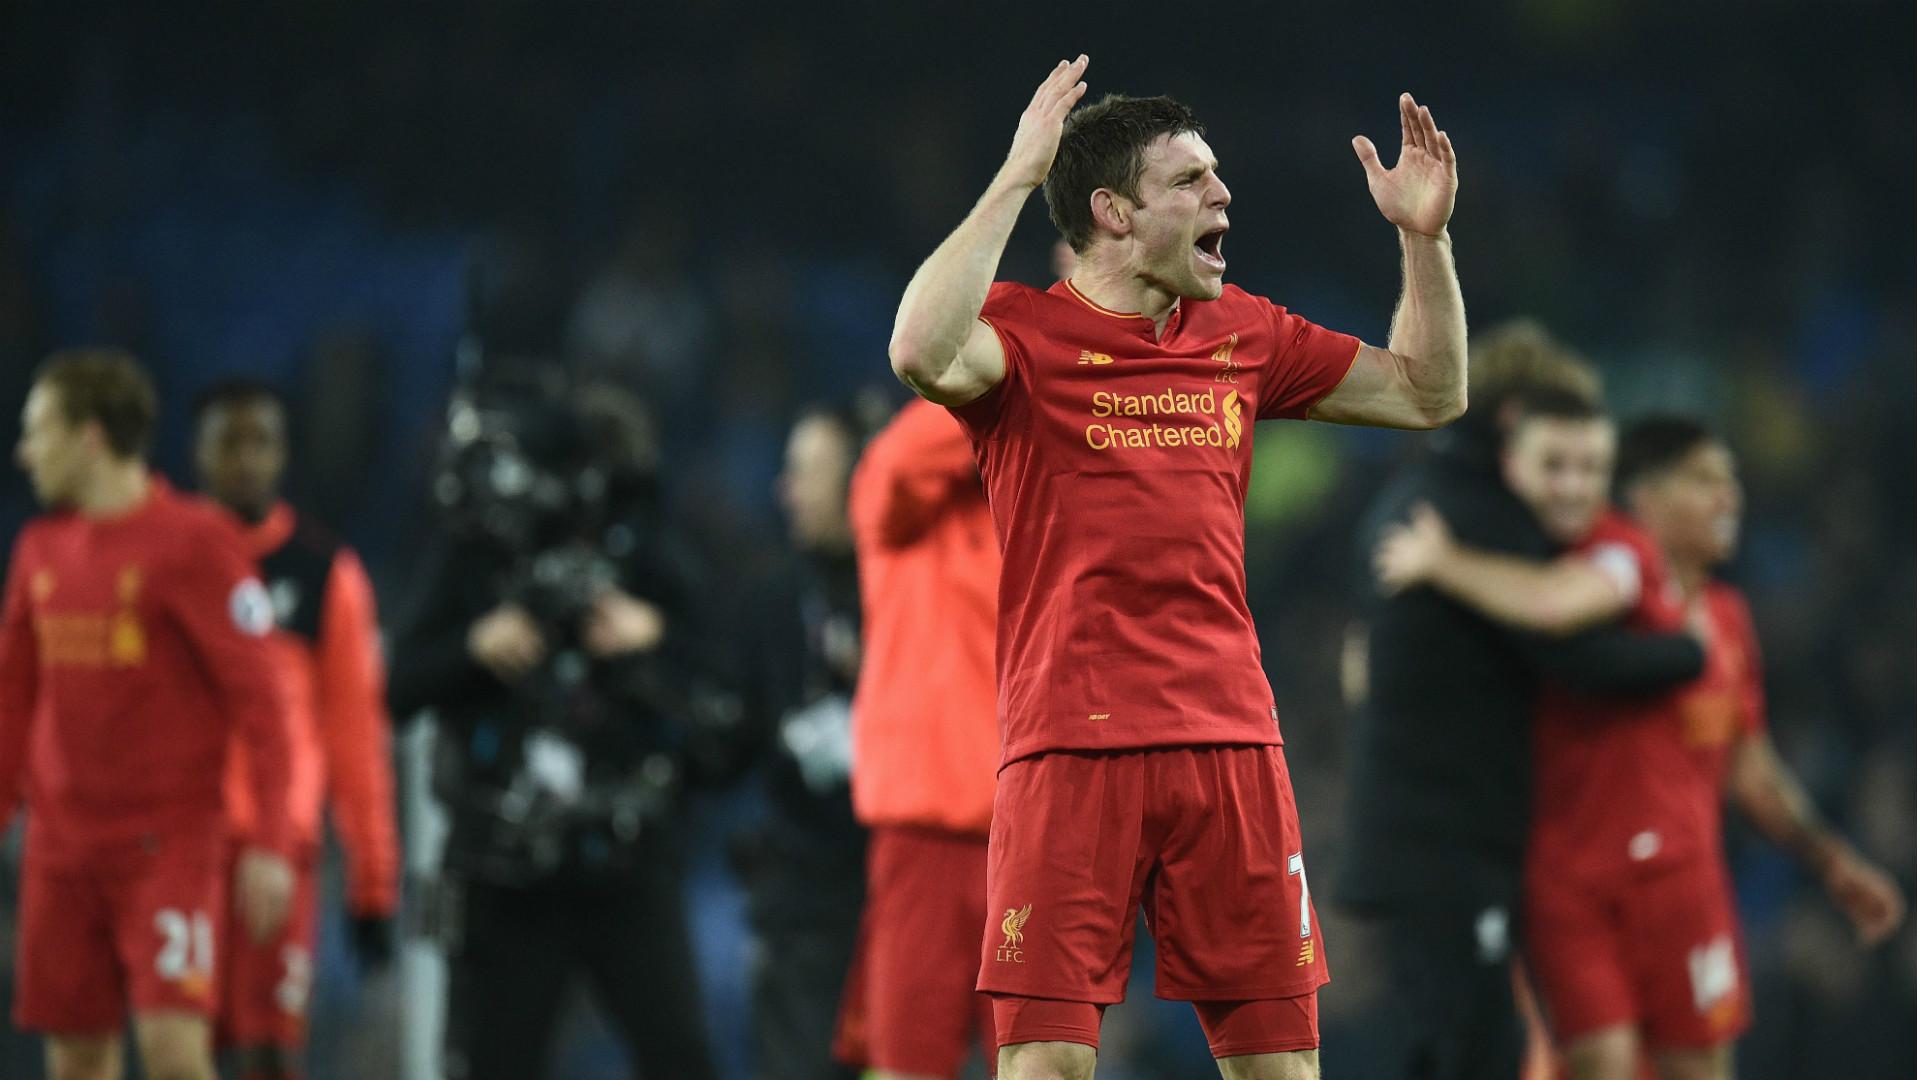 James Milner: From Bit Part At City To Big Shot At